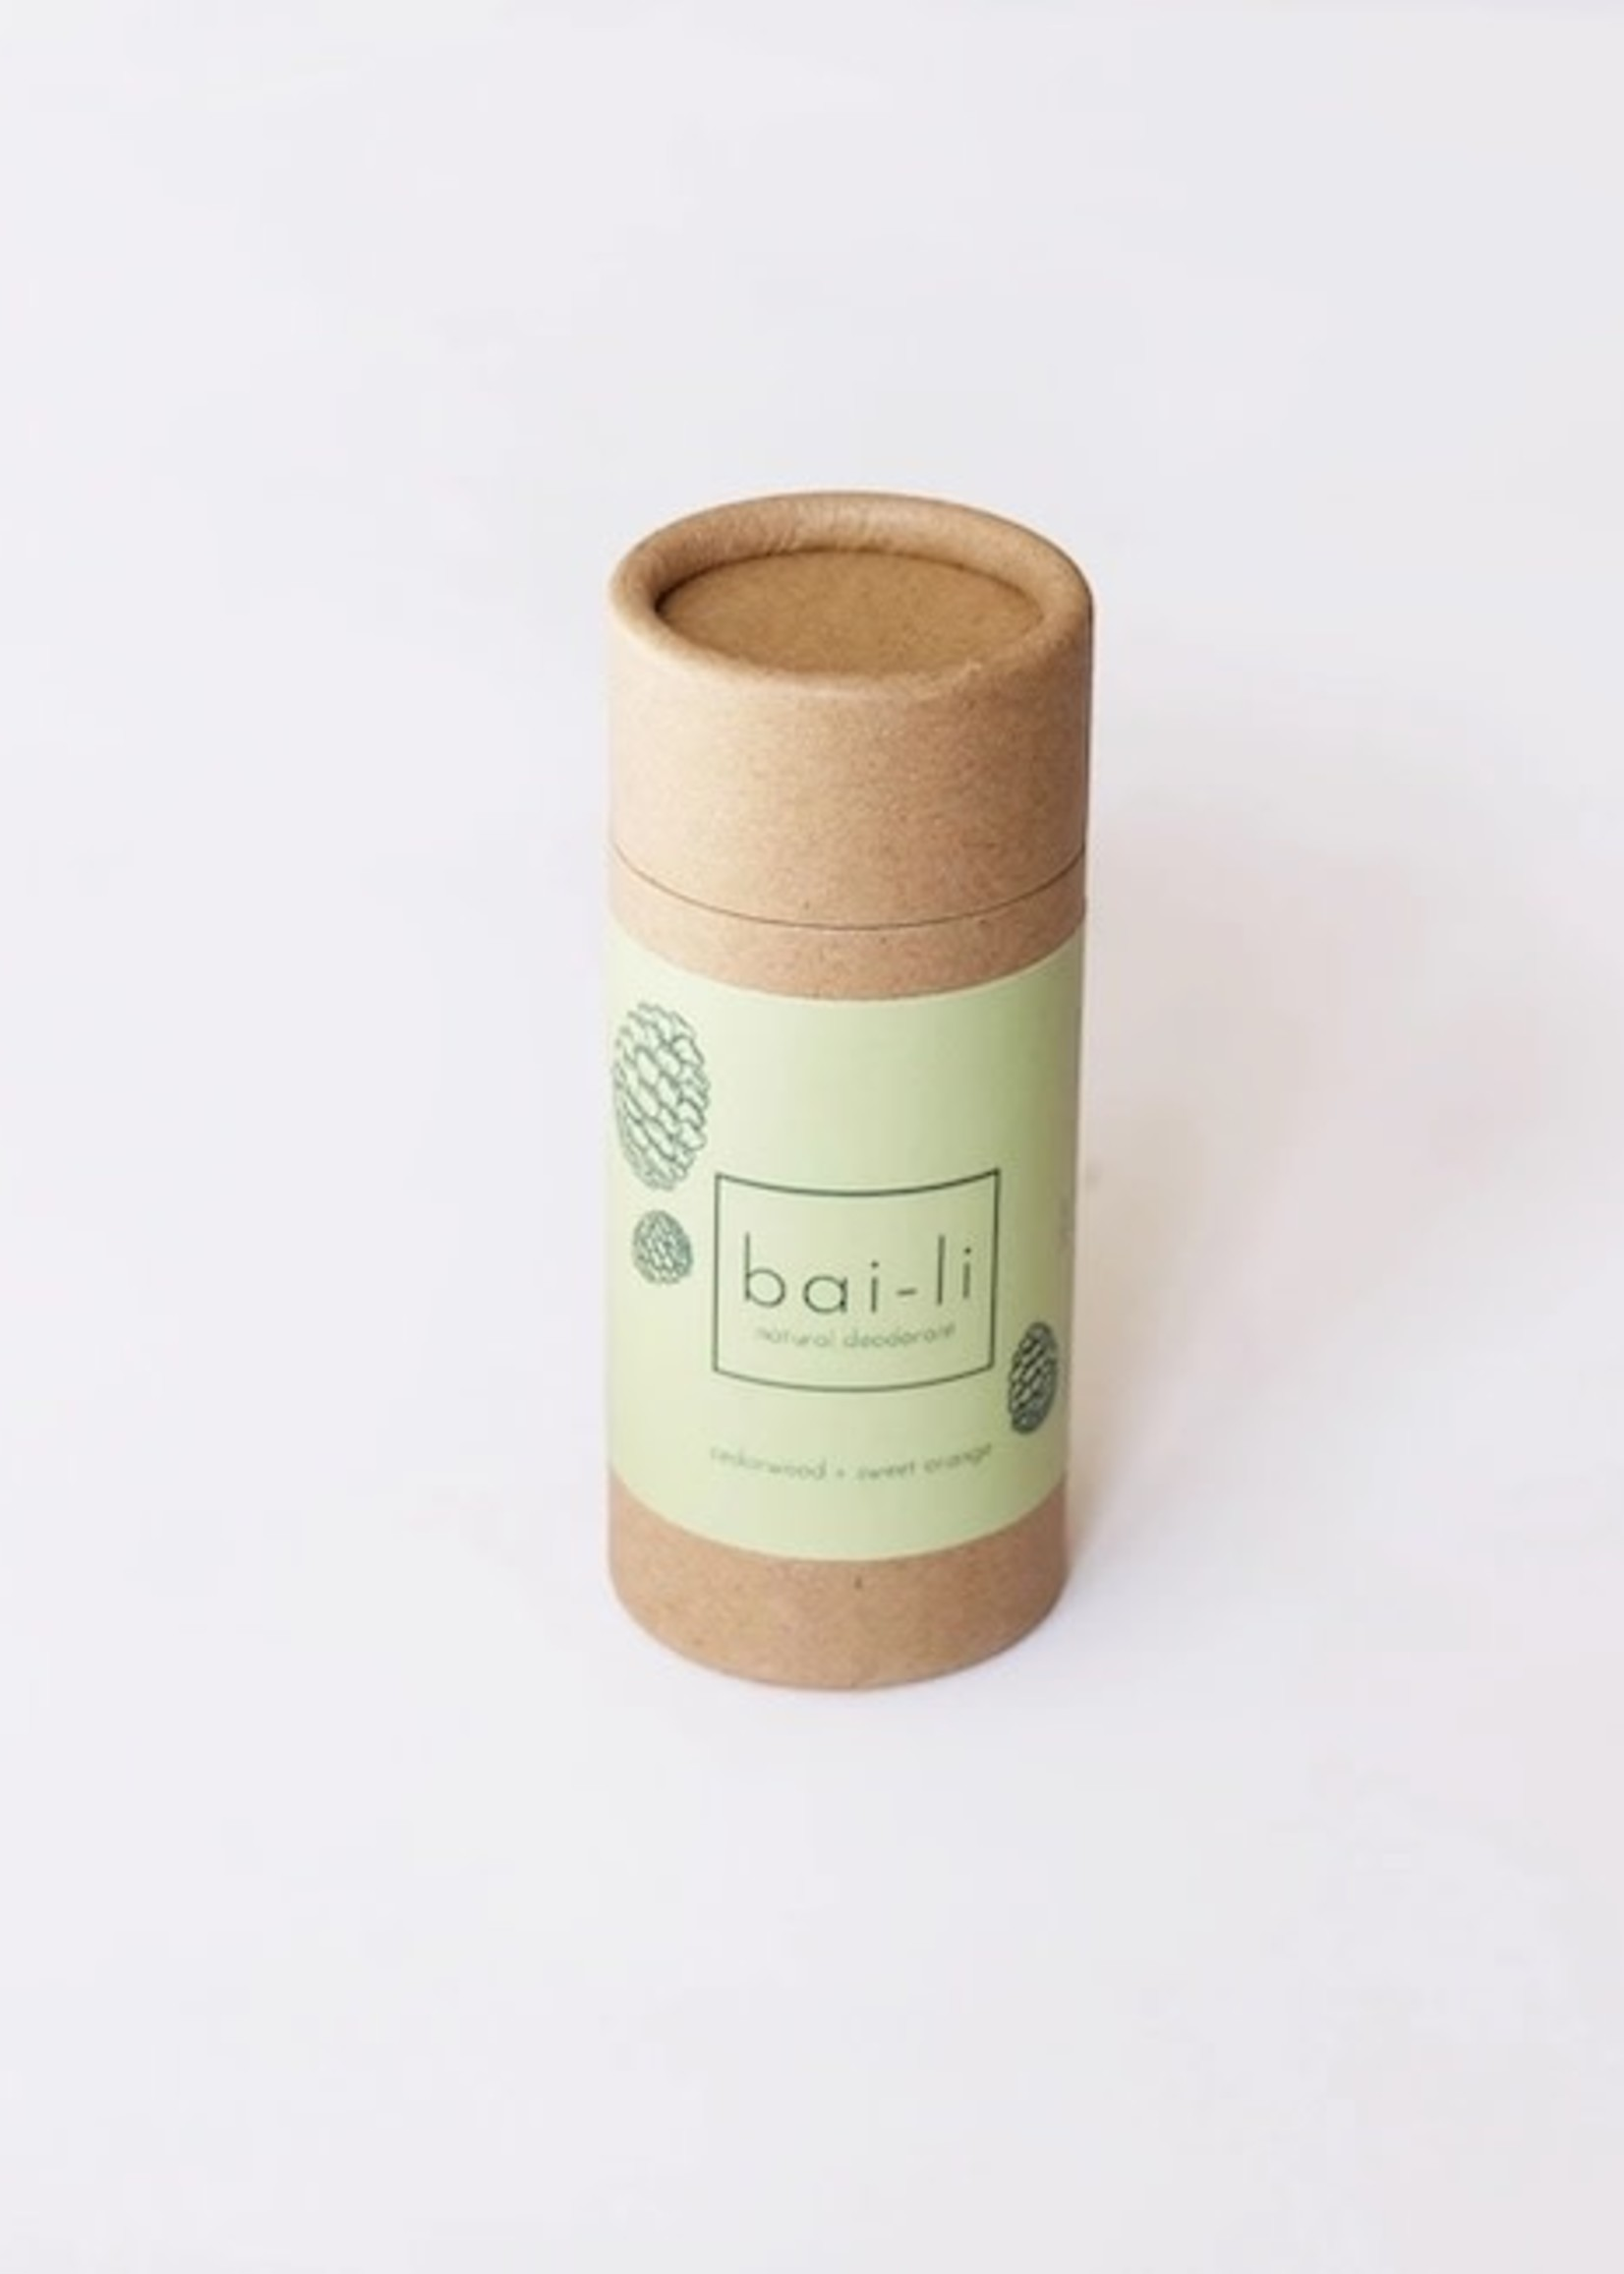 Bai-li Cedarwood Sweet Orange Deodorant